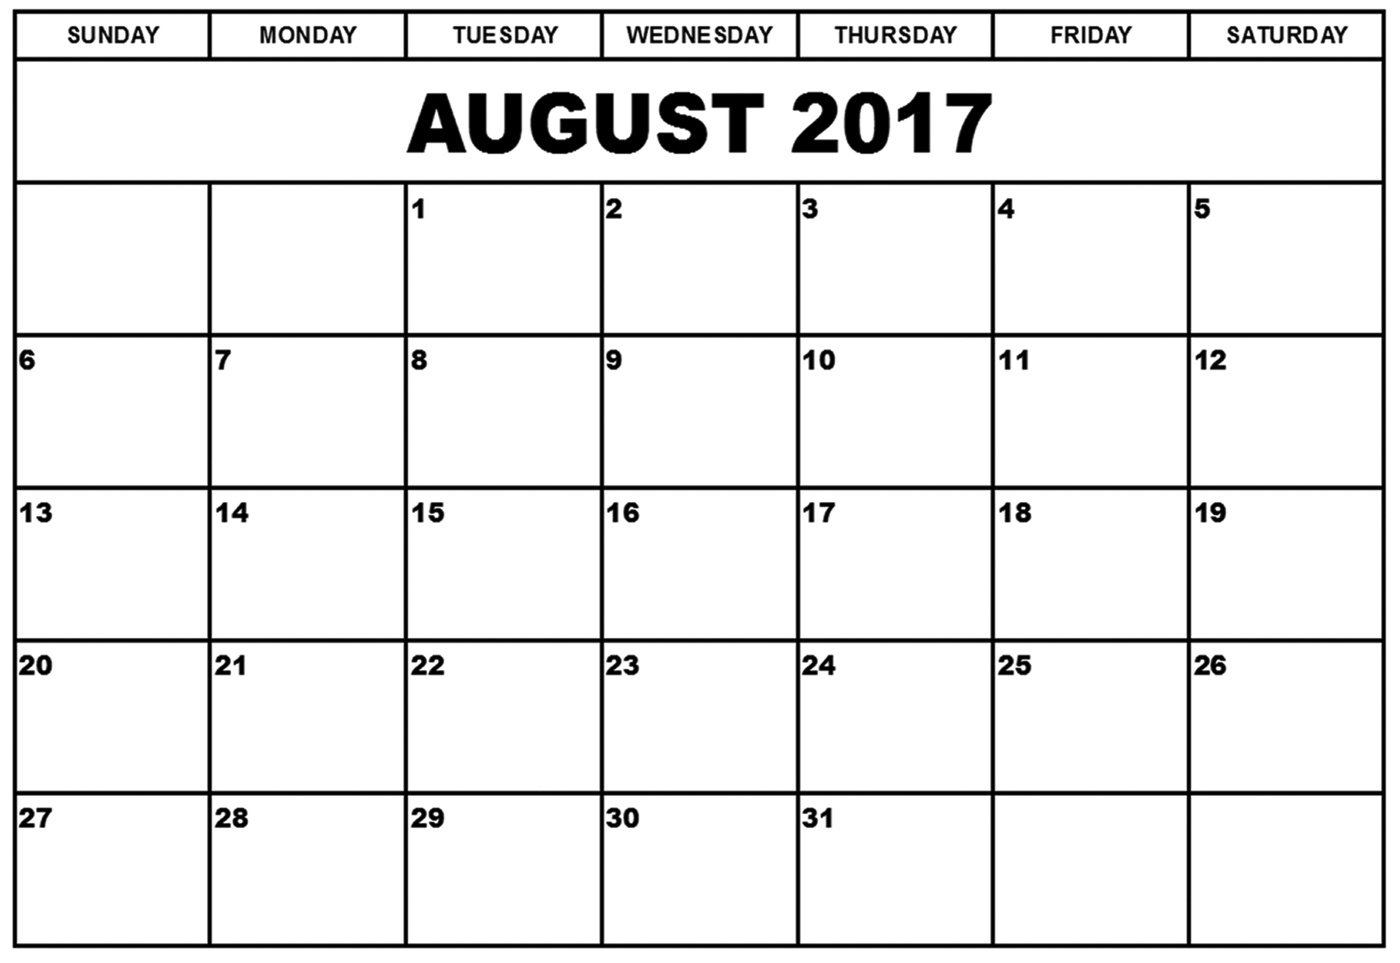 August 2017 Calendar - Printable Monthly Calendar #august2017 #calendar - Free Printable August 2017